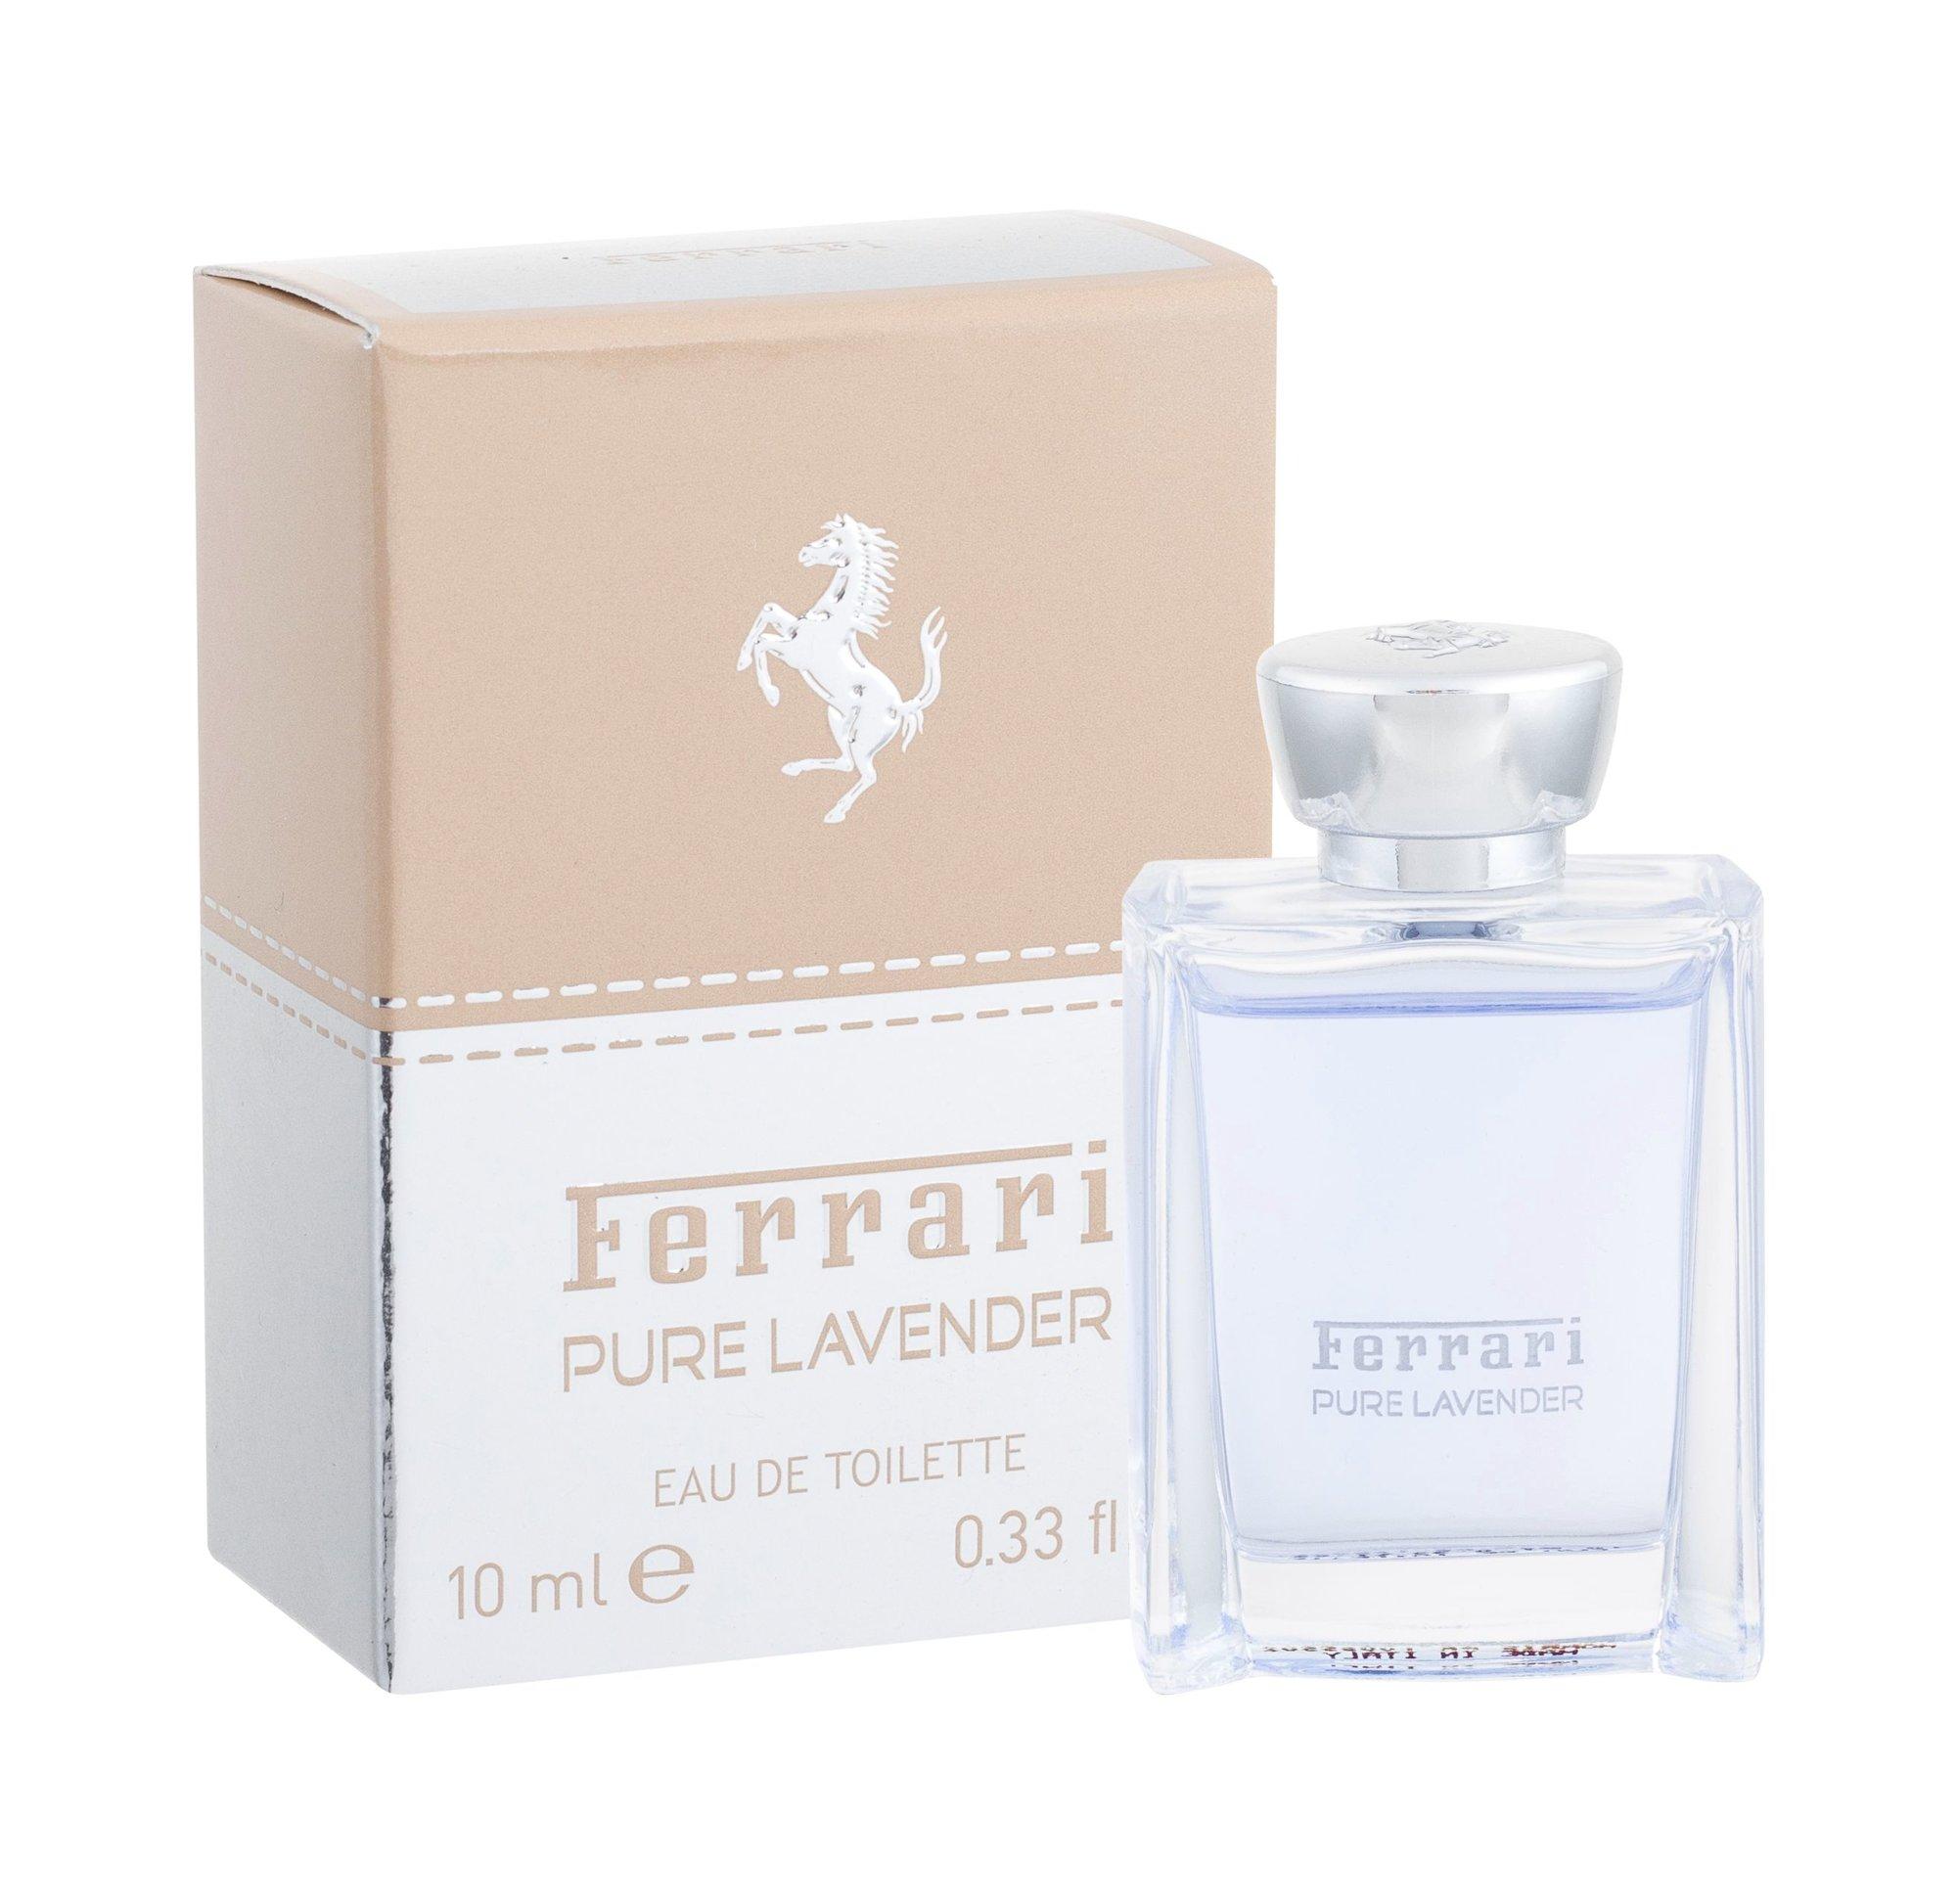 Ferrari Pure Lavender, Toaletná voda 10ml